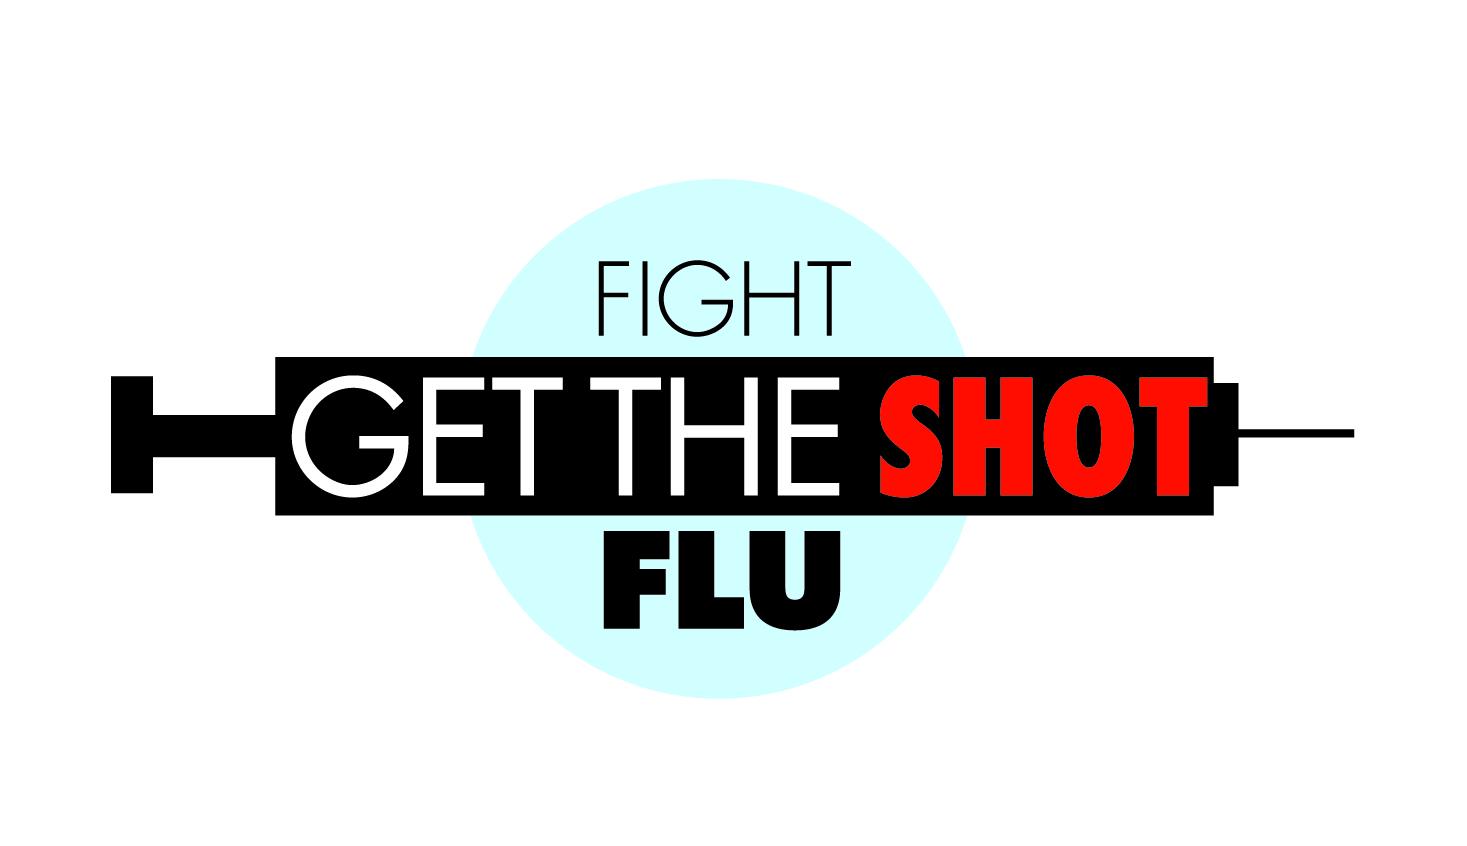 Shot Vaccination Clipart; Flu bug clipart; Flu Shot ...